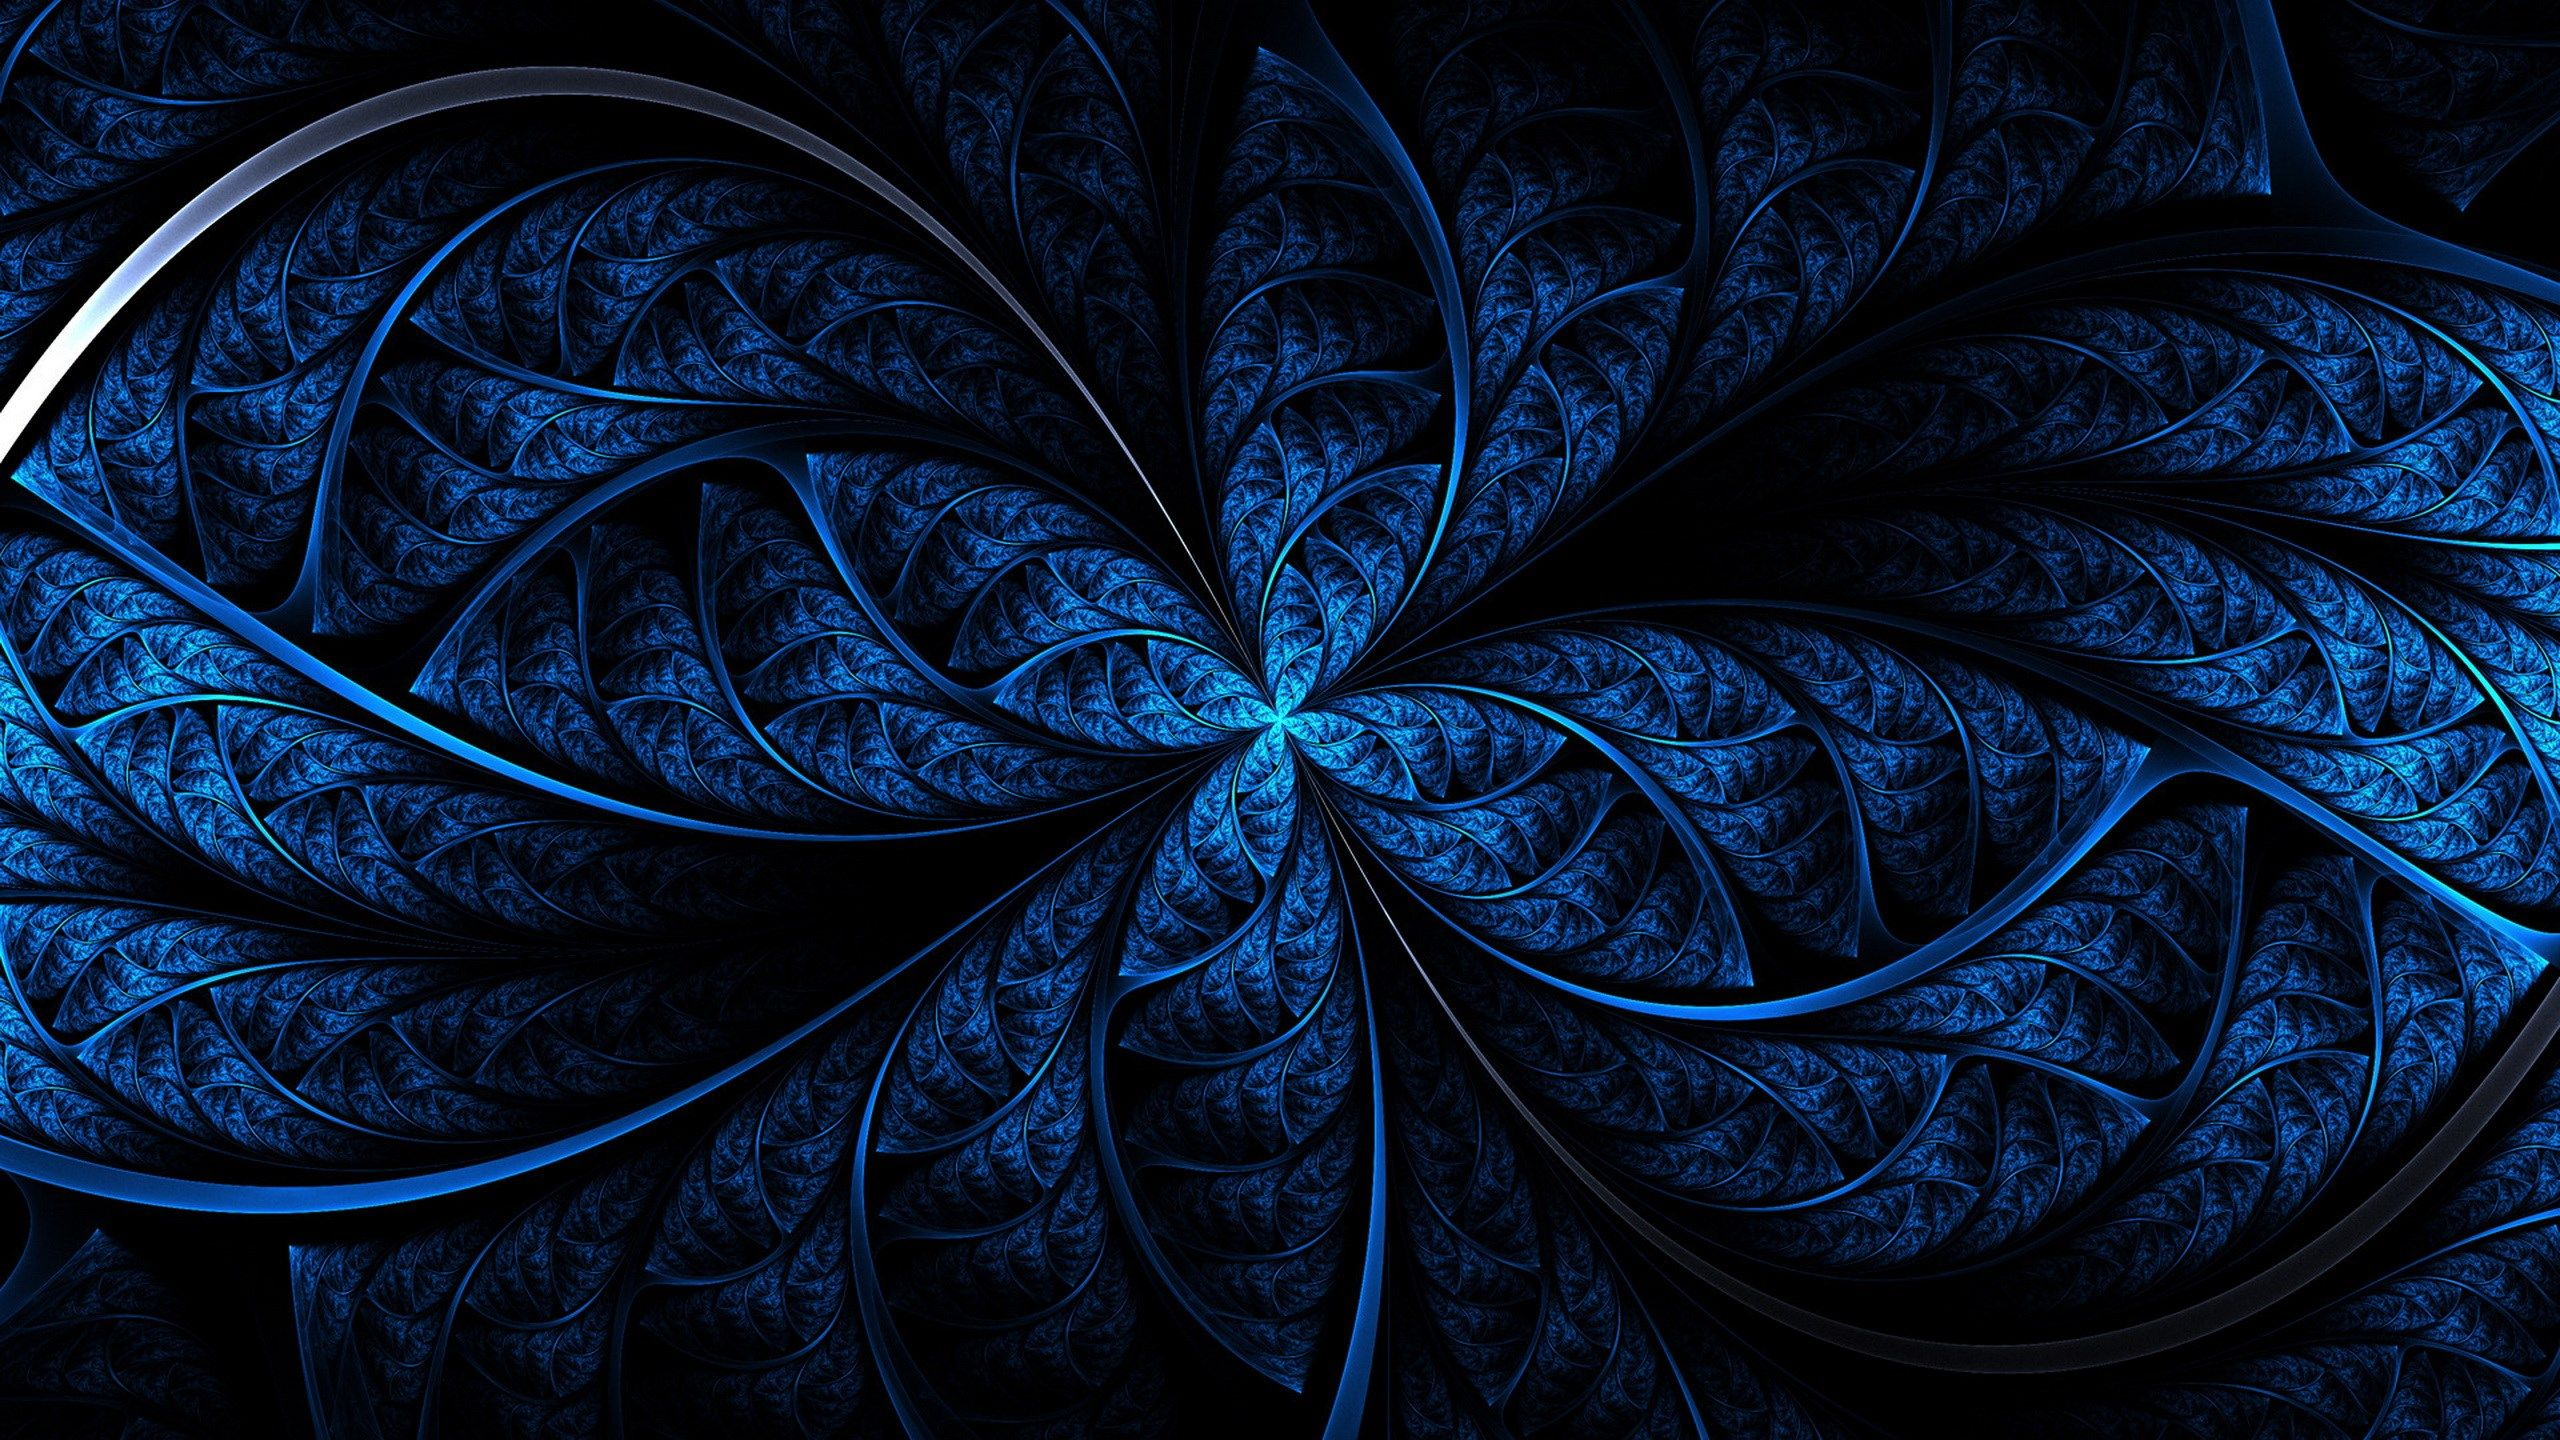 2017 03 23 Fractal Background Desktop Free 1948650 Blauw